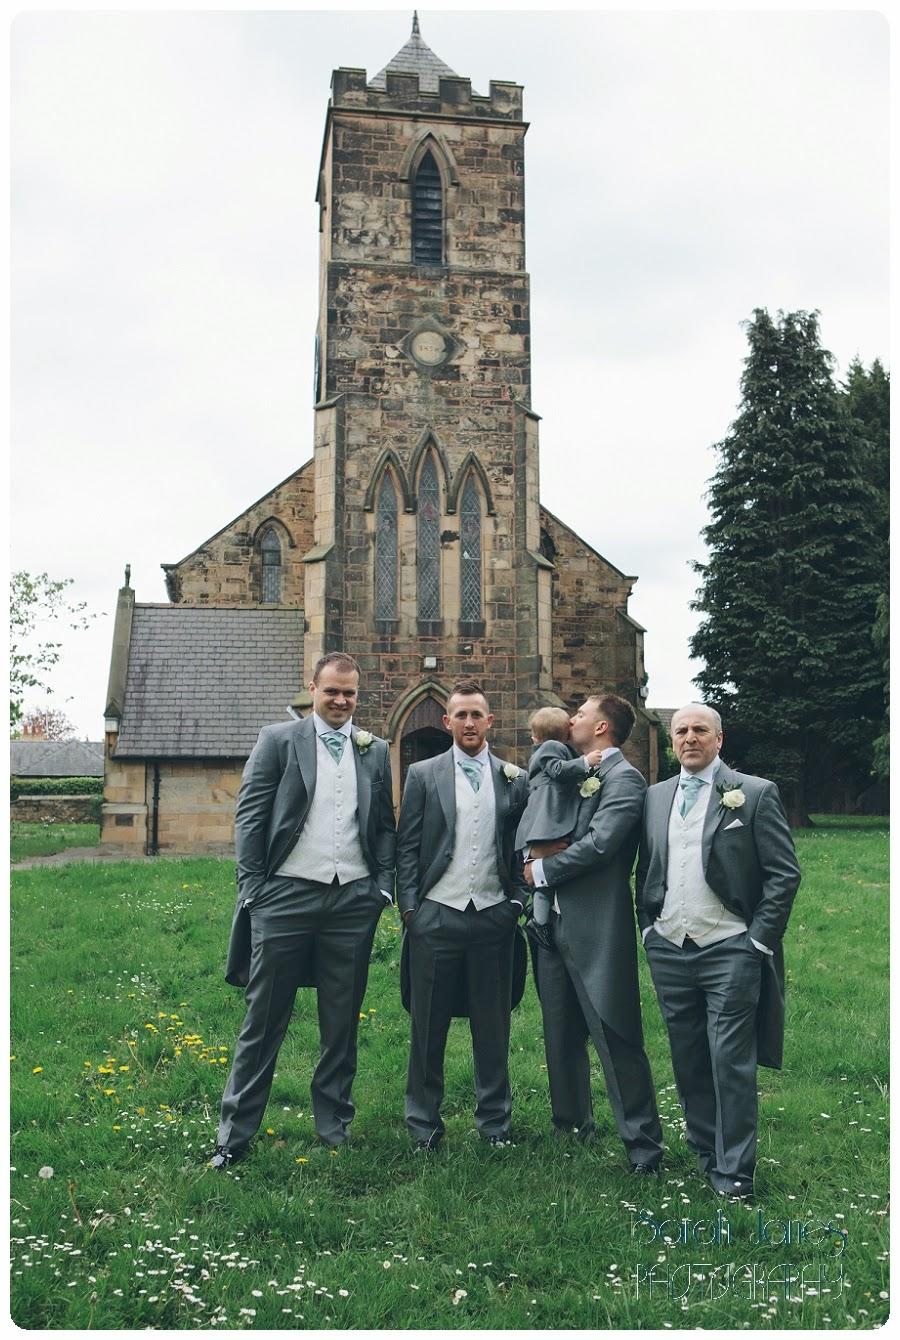 Sarah+Janes+photography,+wedding+photography,barn+wedding+north+wales_0007.jpg